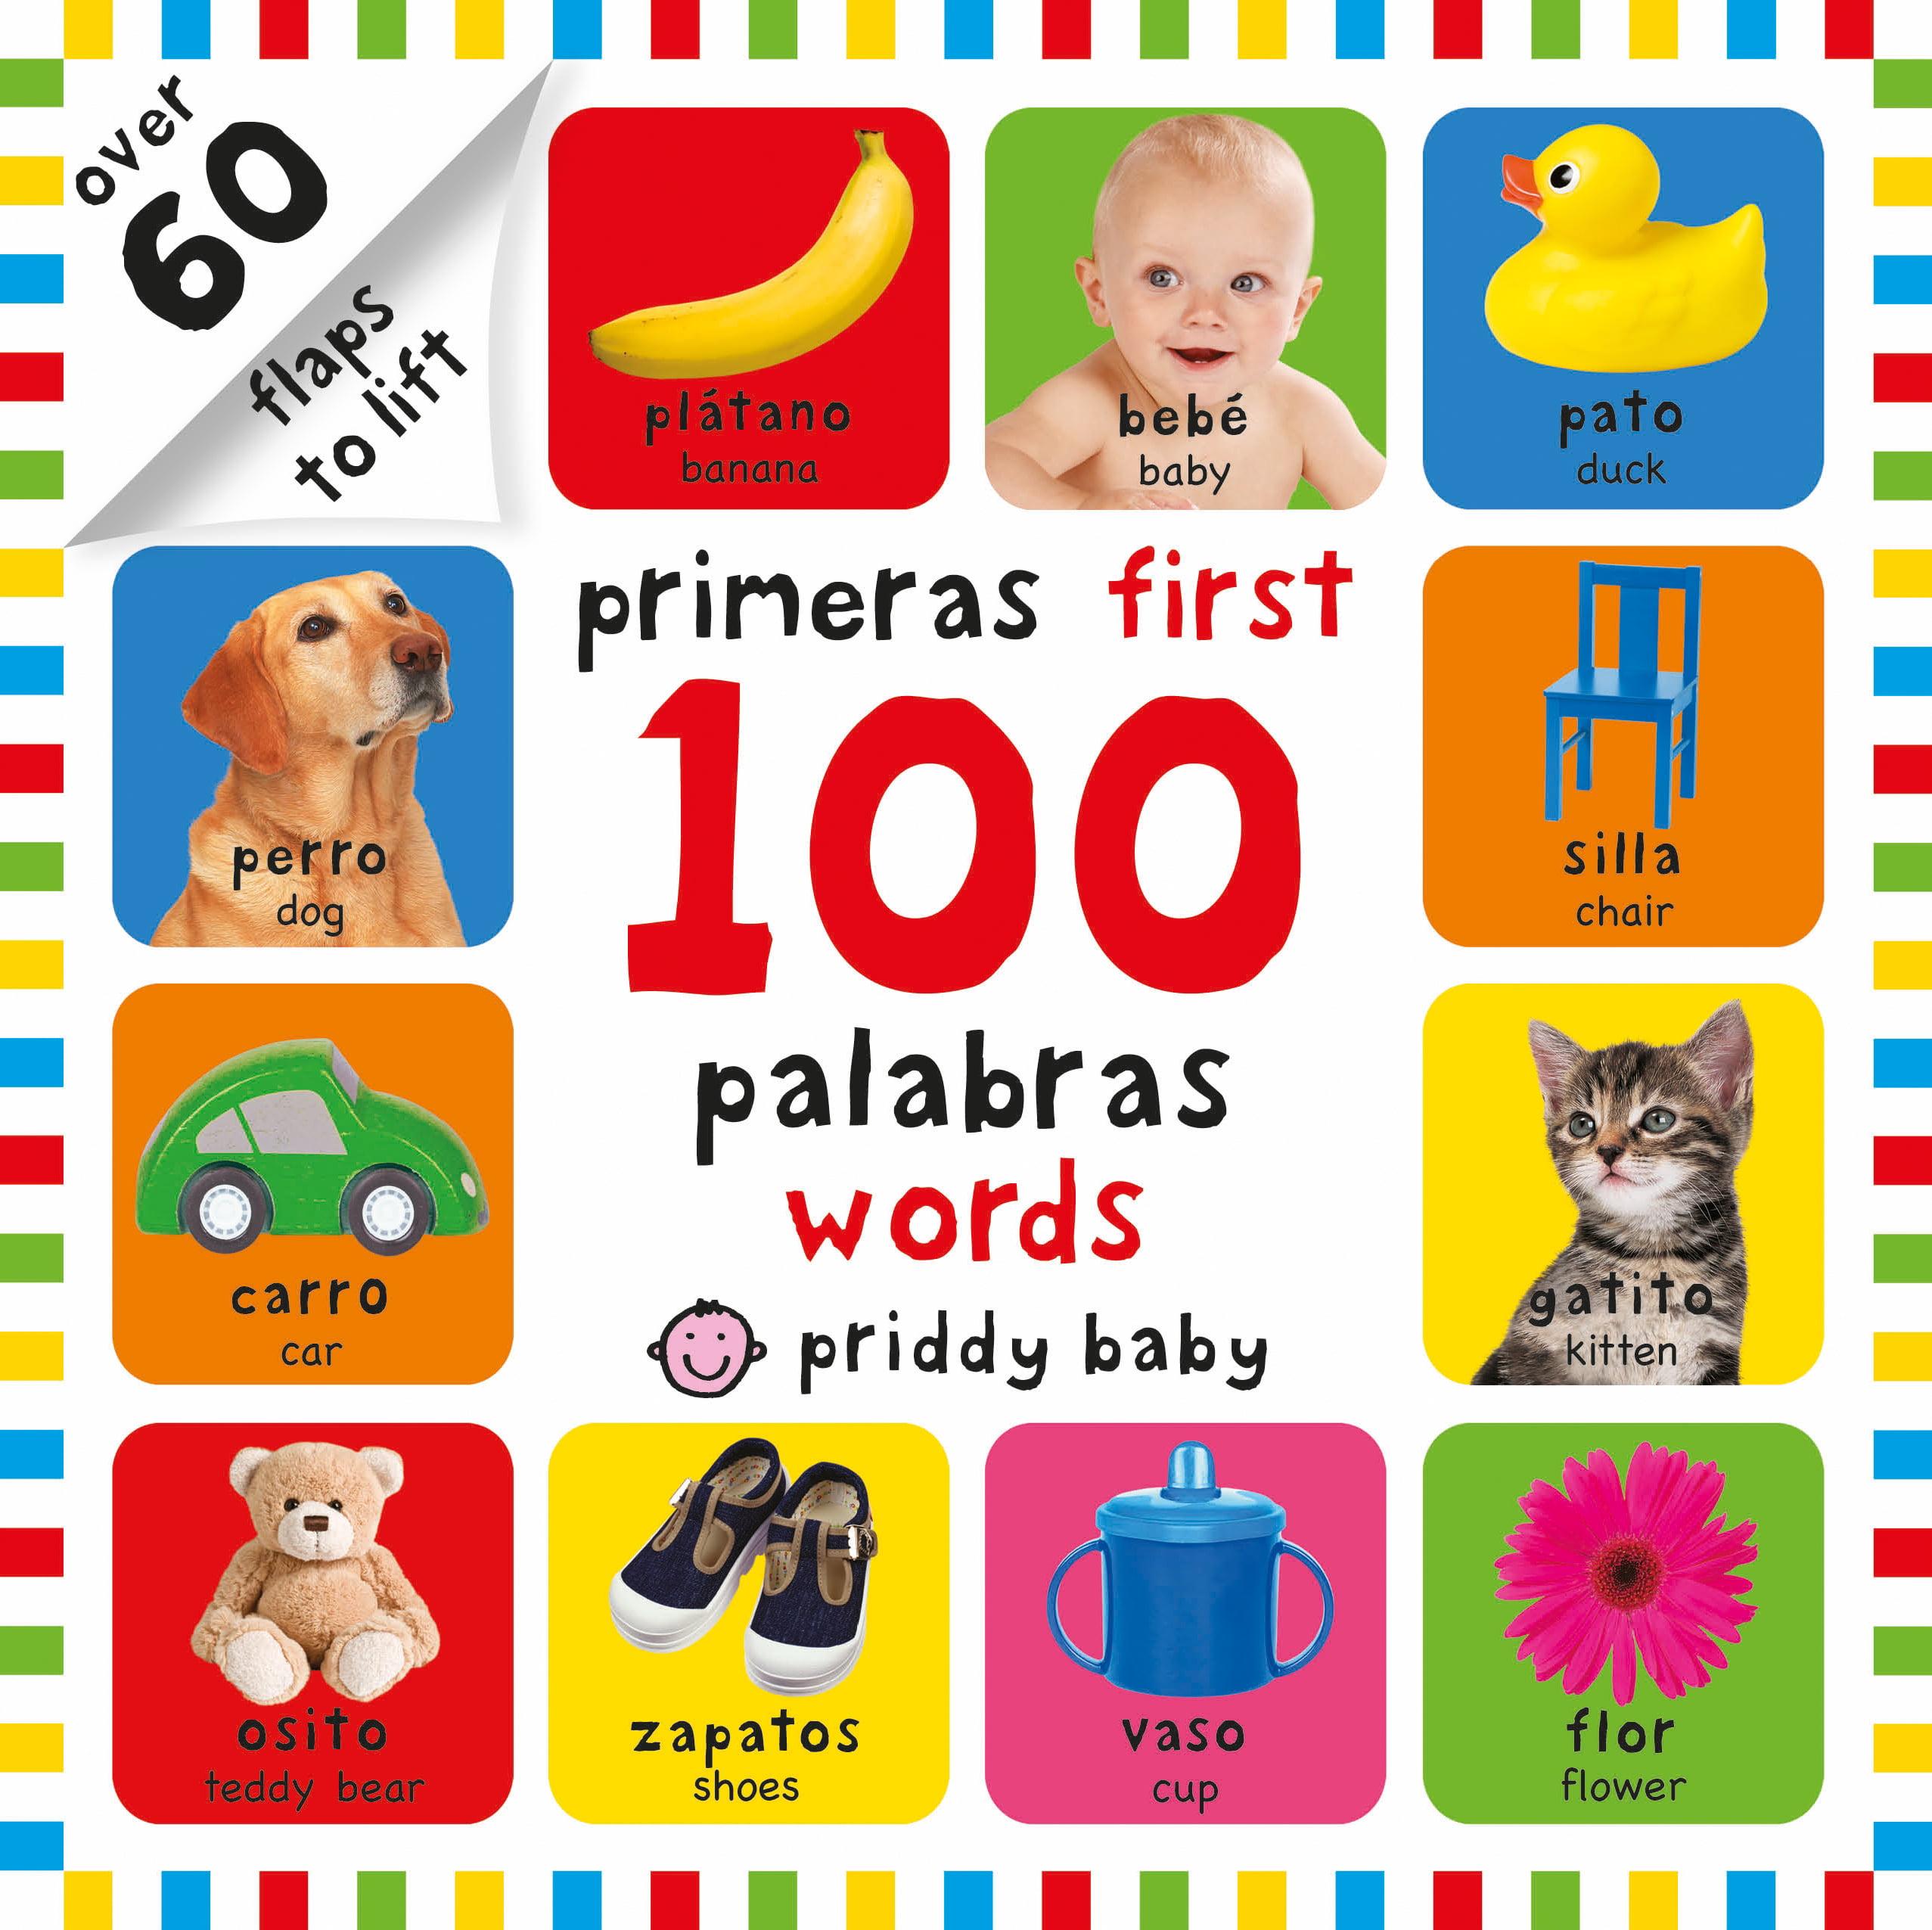 Primeras First 100 palabras words (Board Book)